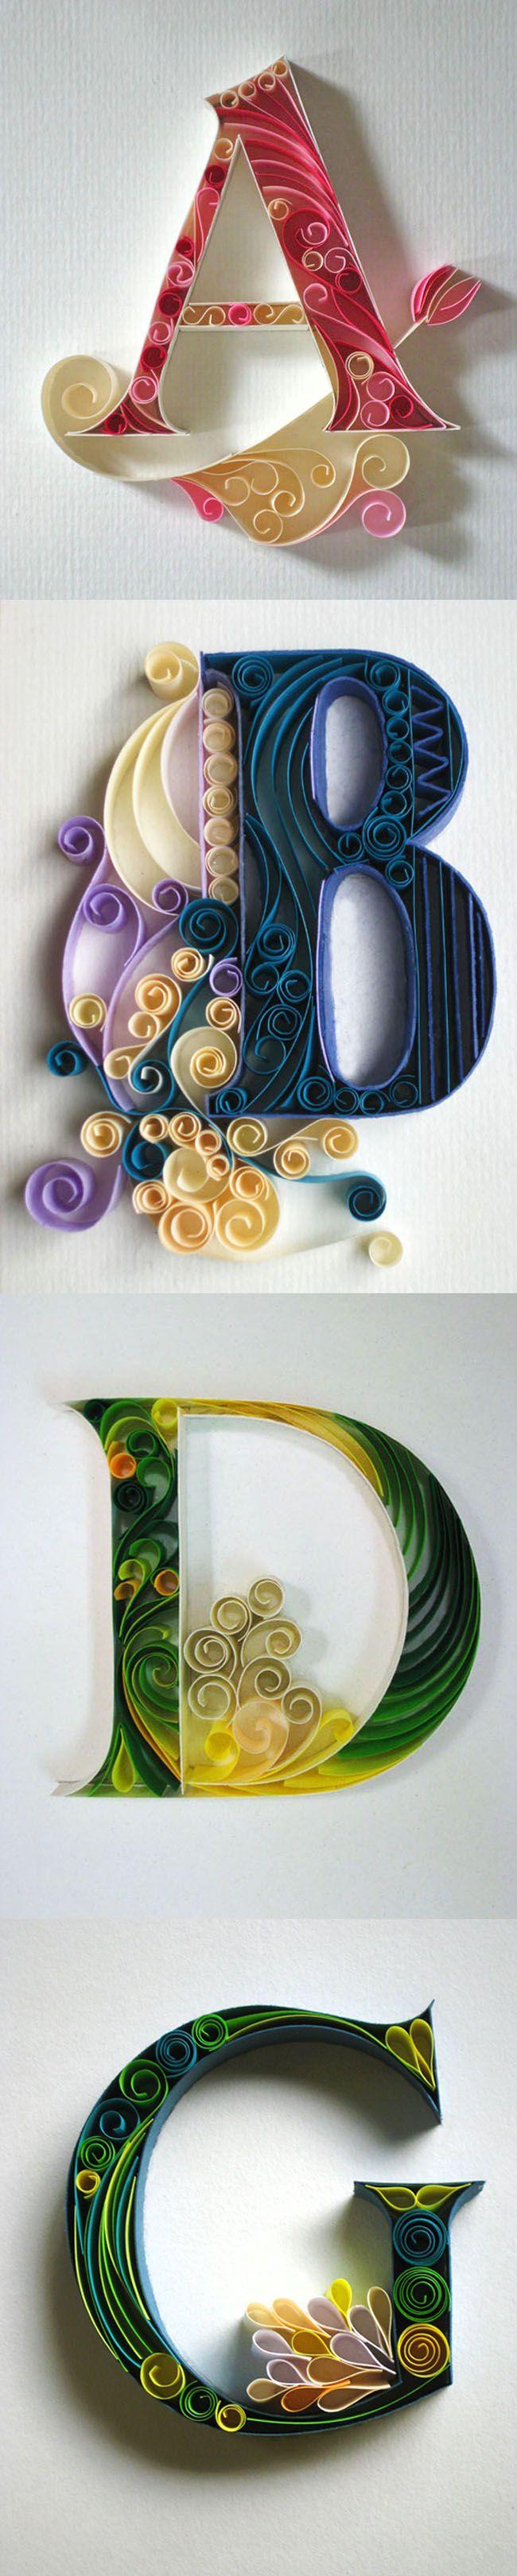 paper +  typography   by  sabeena karnik    http://www.typographyserved.com/gallery/paper-typography/858836                                                                                                                                                                                 Más